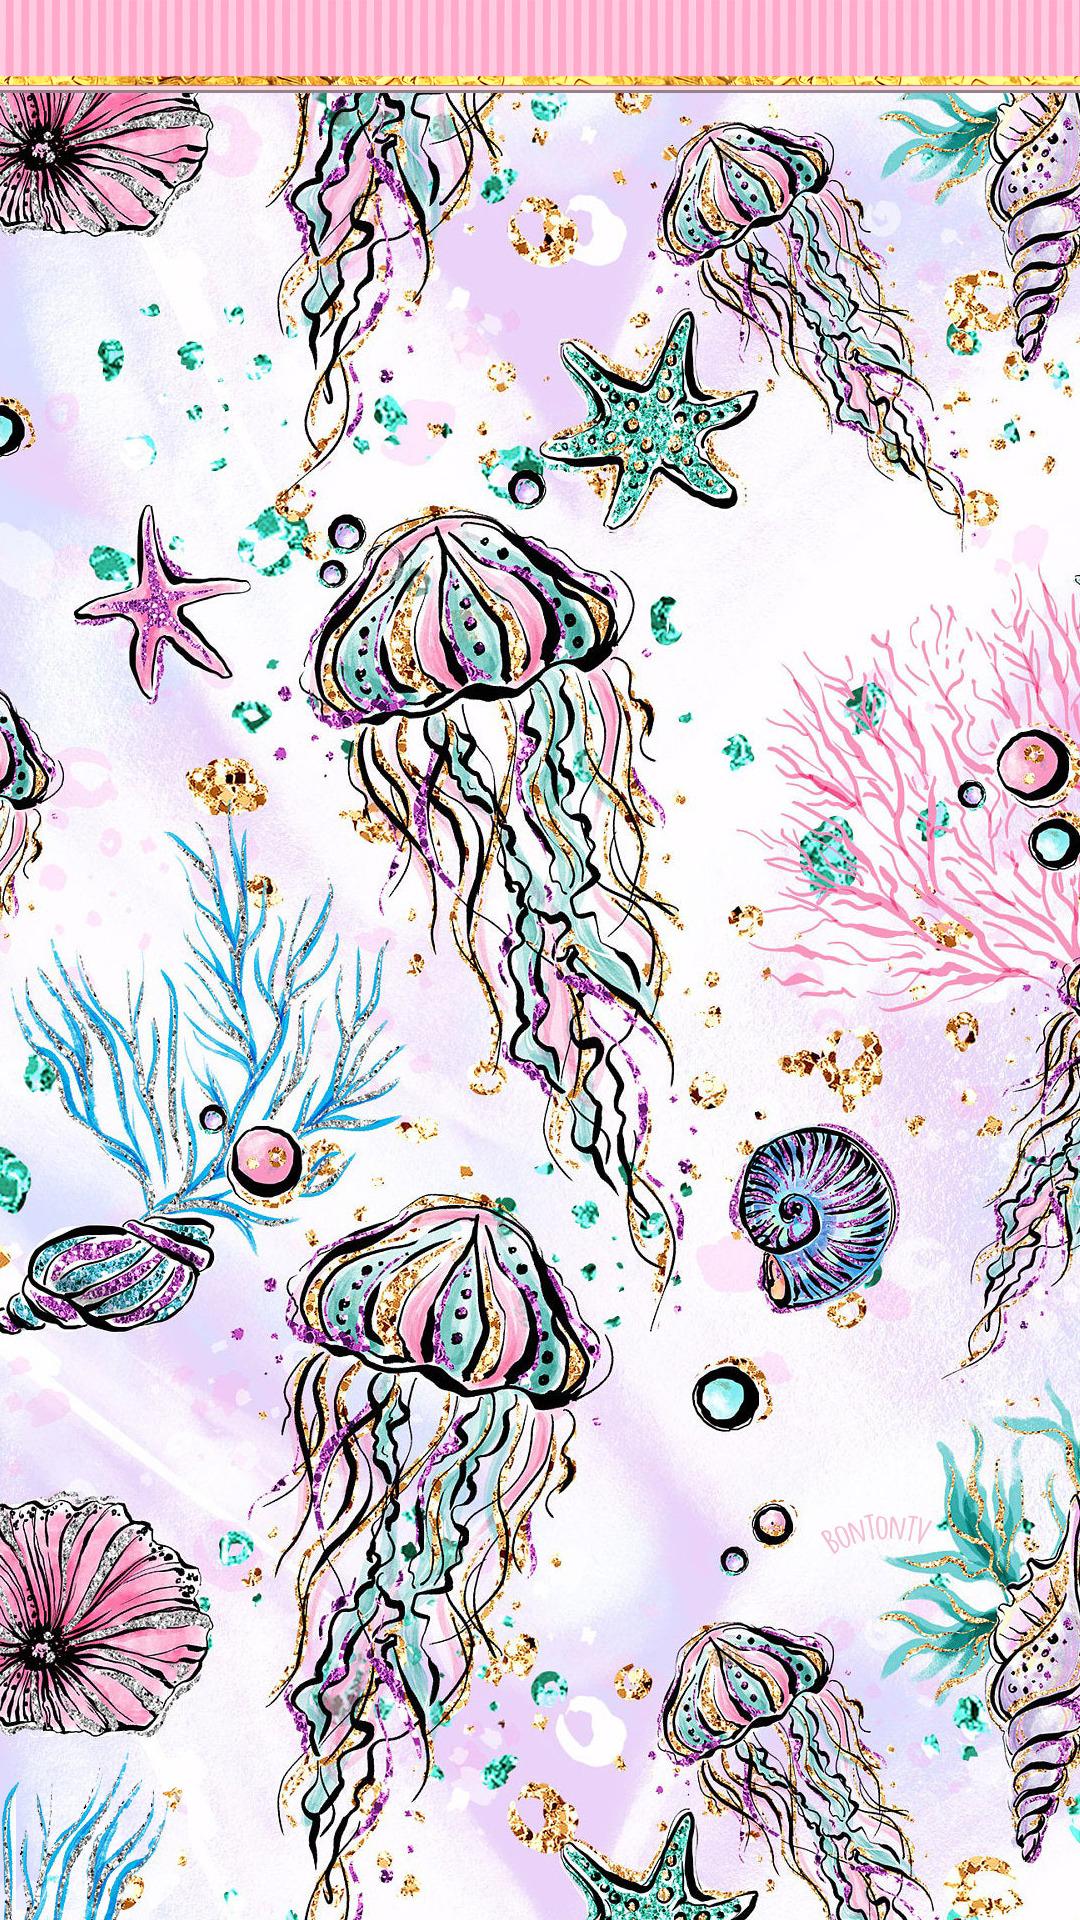 Phone Wallpapers Hd Cute Glitter Sea Life Background Stars Jellyfish Seashells By Bo Mermaid Wallpaper Iphone Love Wallpaper Backgrounds Mermaid Wallpapers